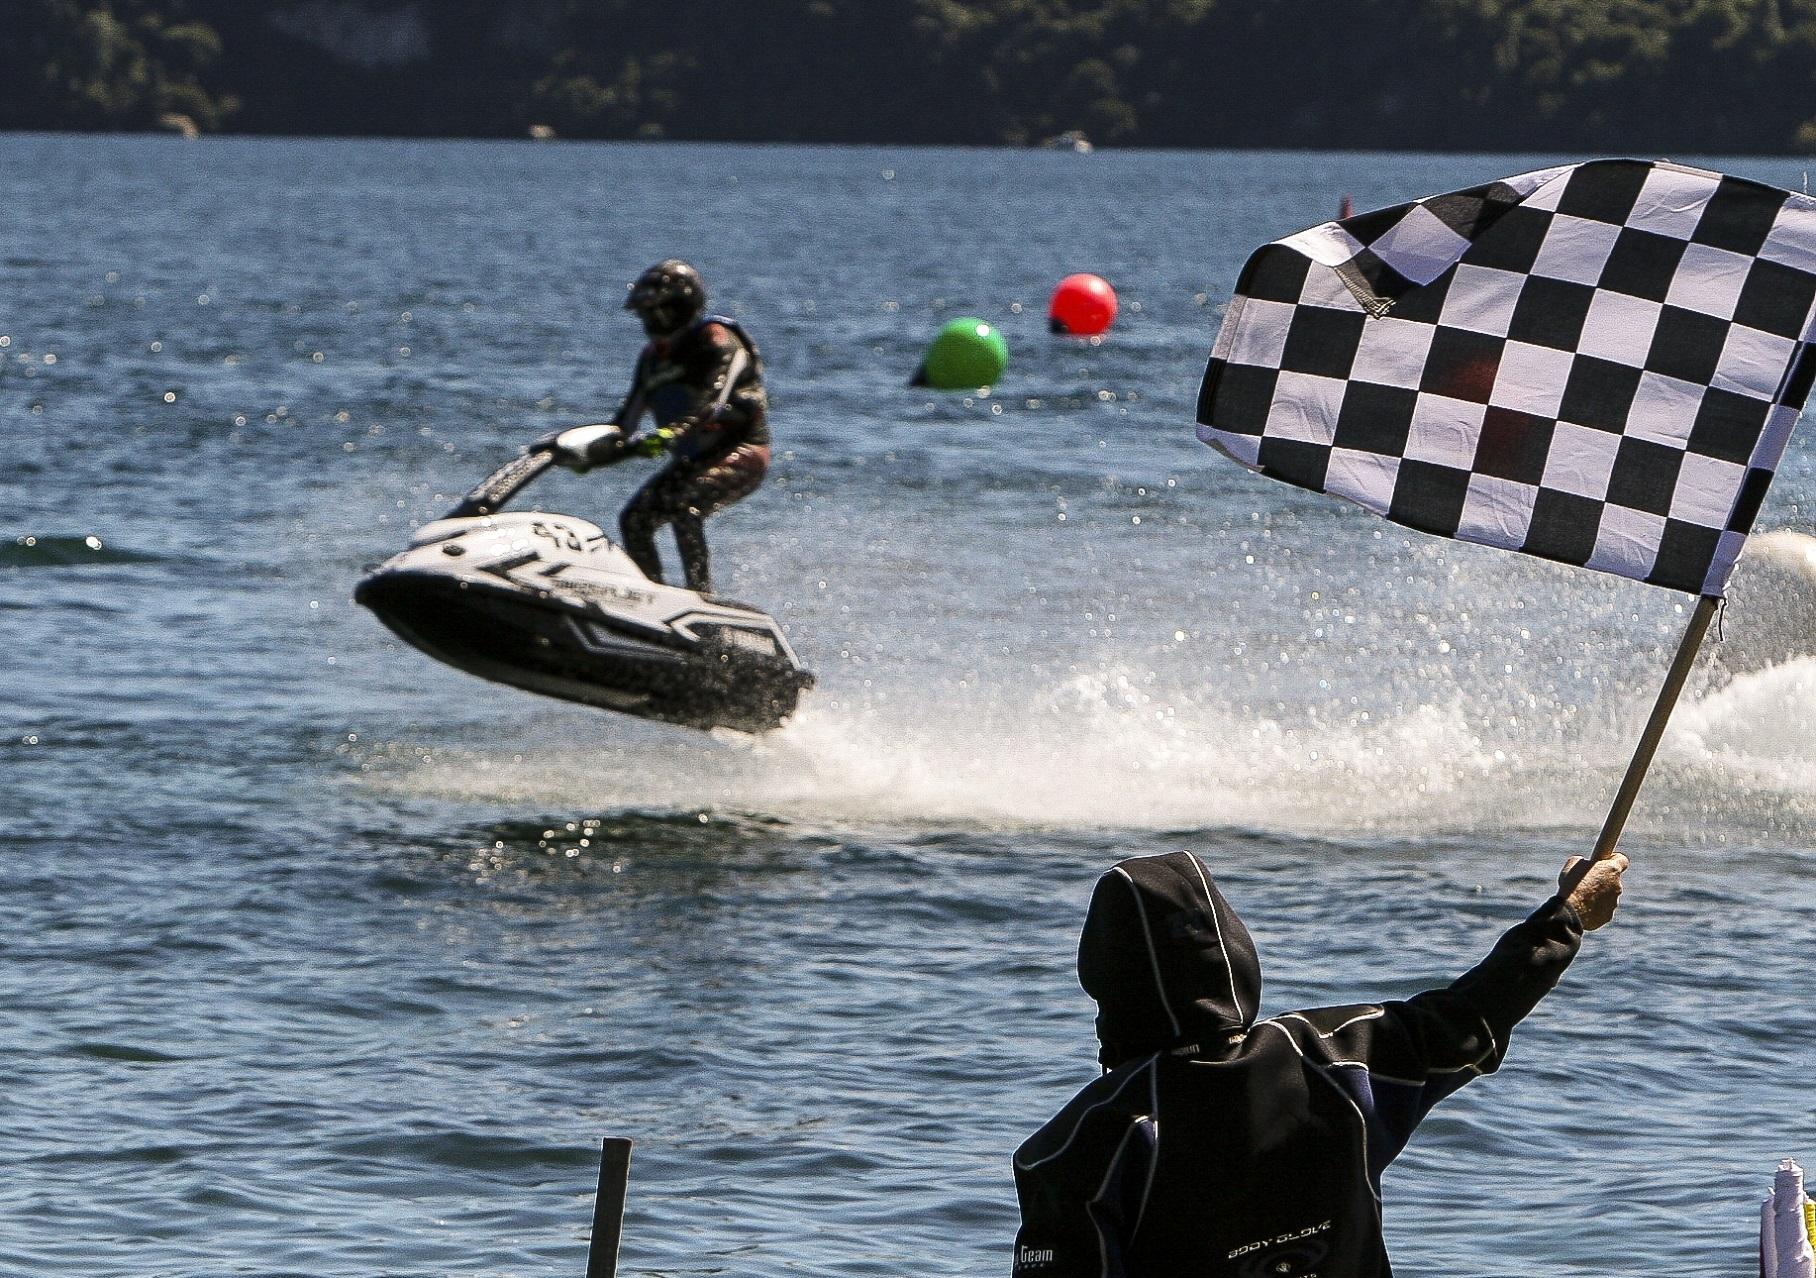 About Us - Jet Ski Racing Nz, Racing Alongside Nz Power Boats